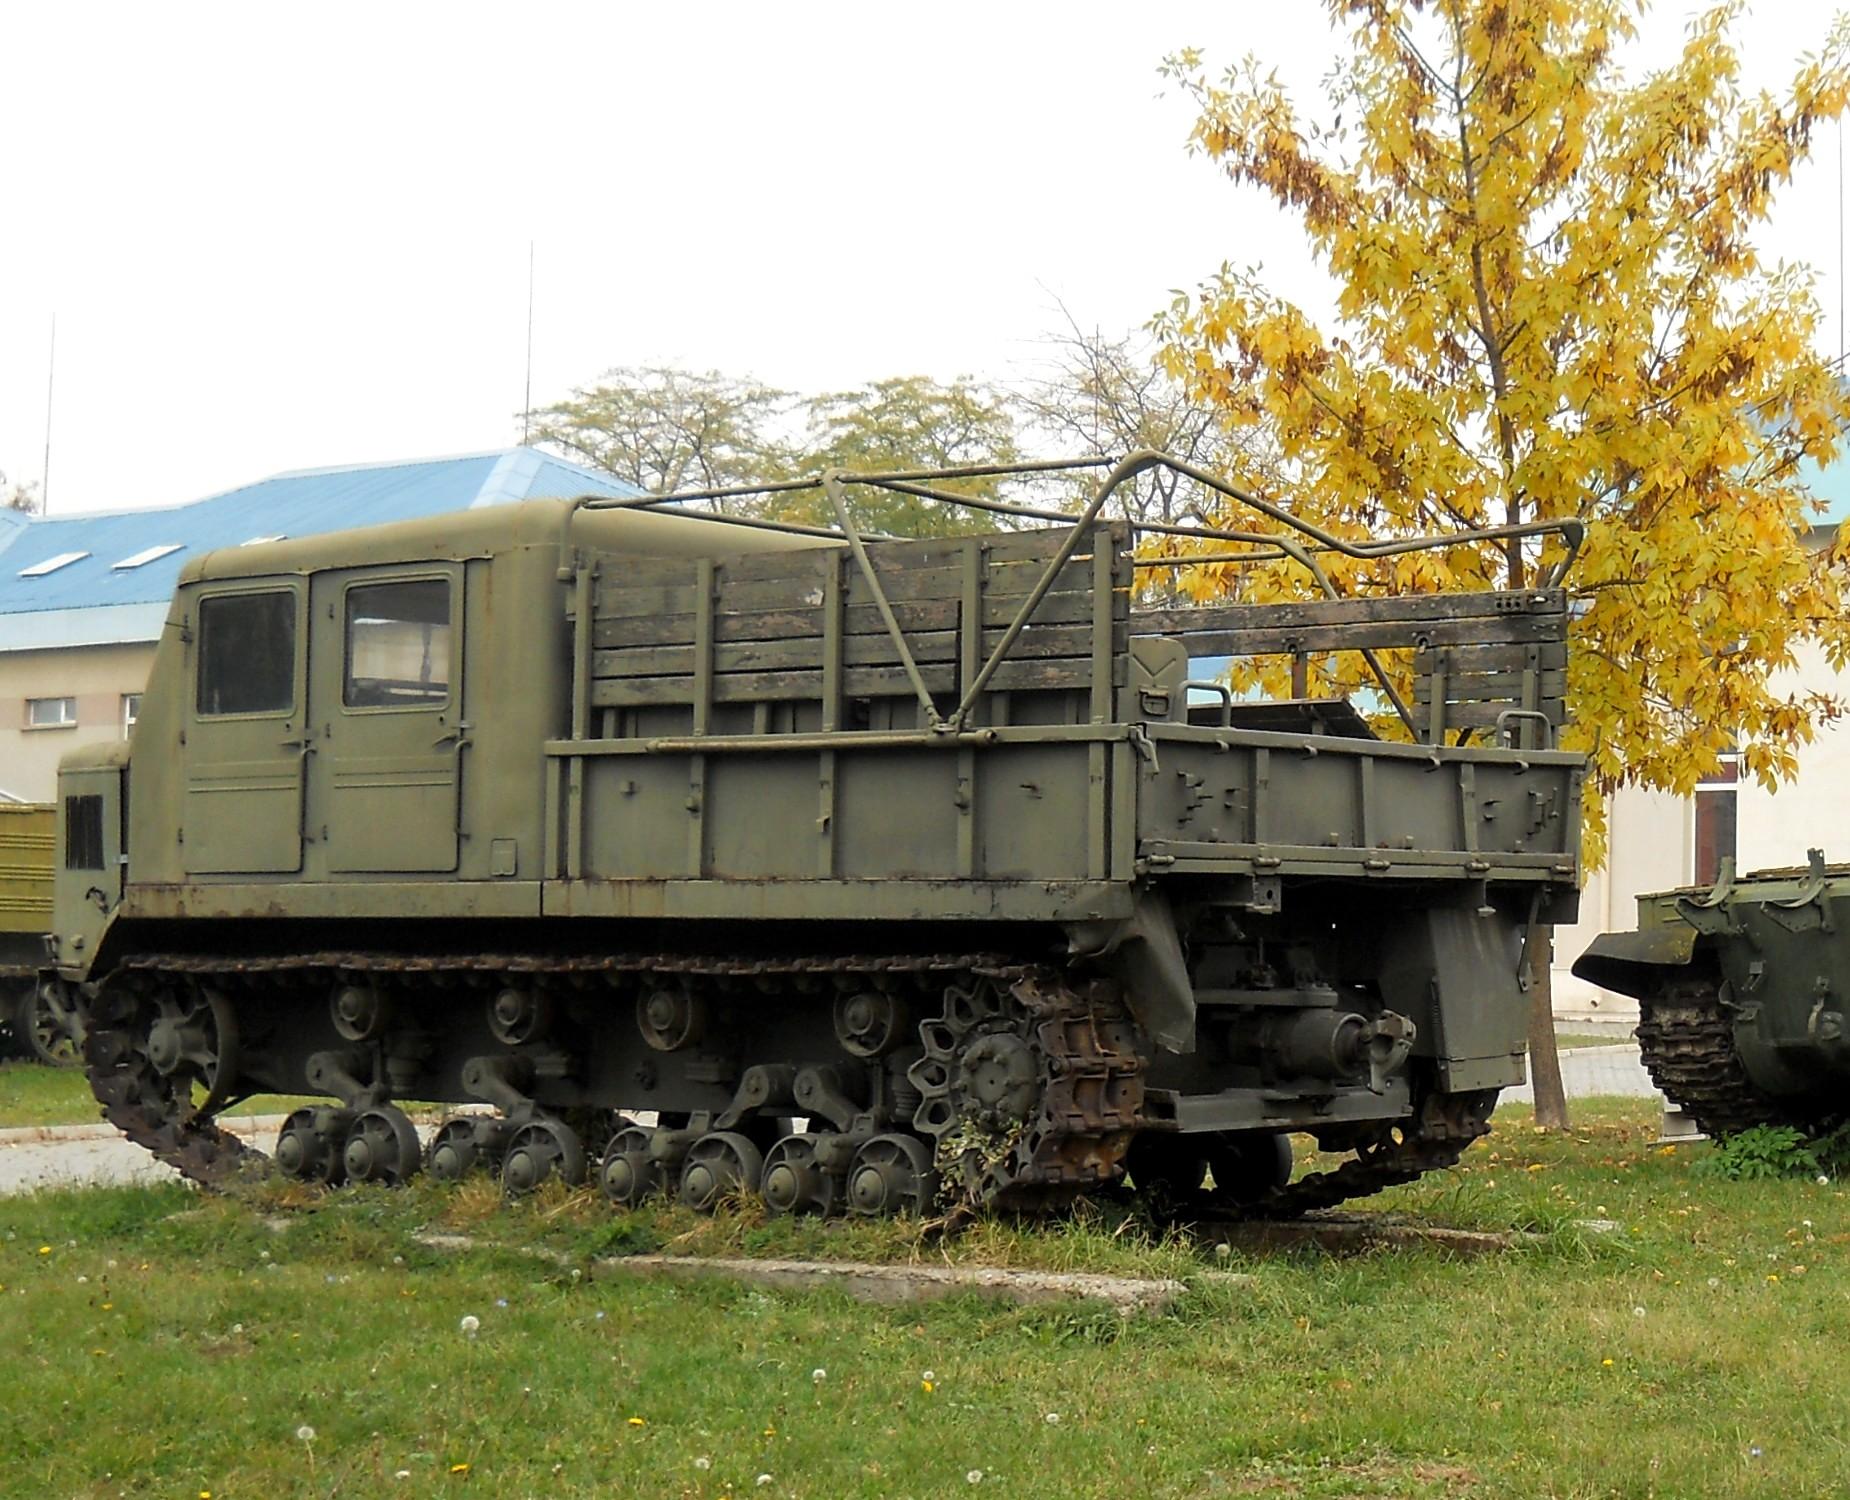 FileSofia Bulgaria AT S artillery tractorjpg  : SofiaBulgaria AT Sartillerytractor from commons.wikimedia.org size 1850 x 1500 jpeg 704kB